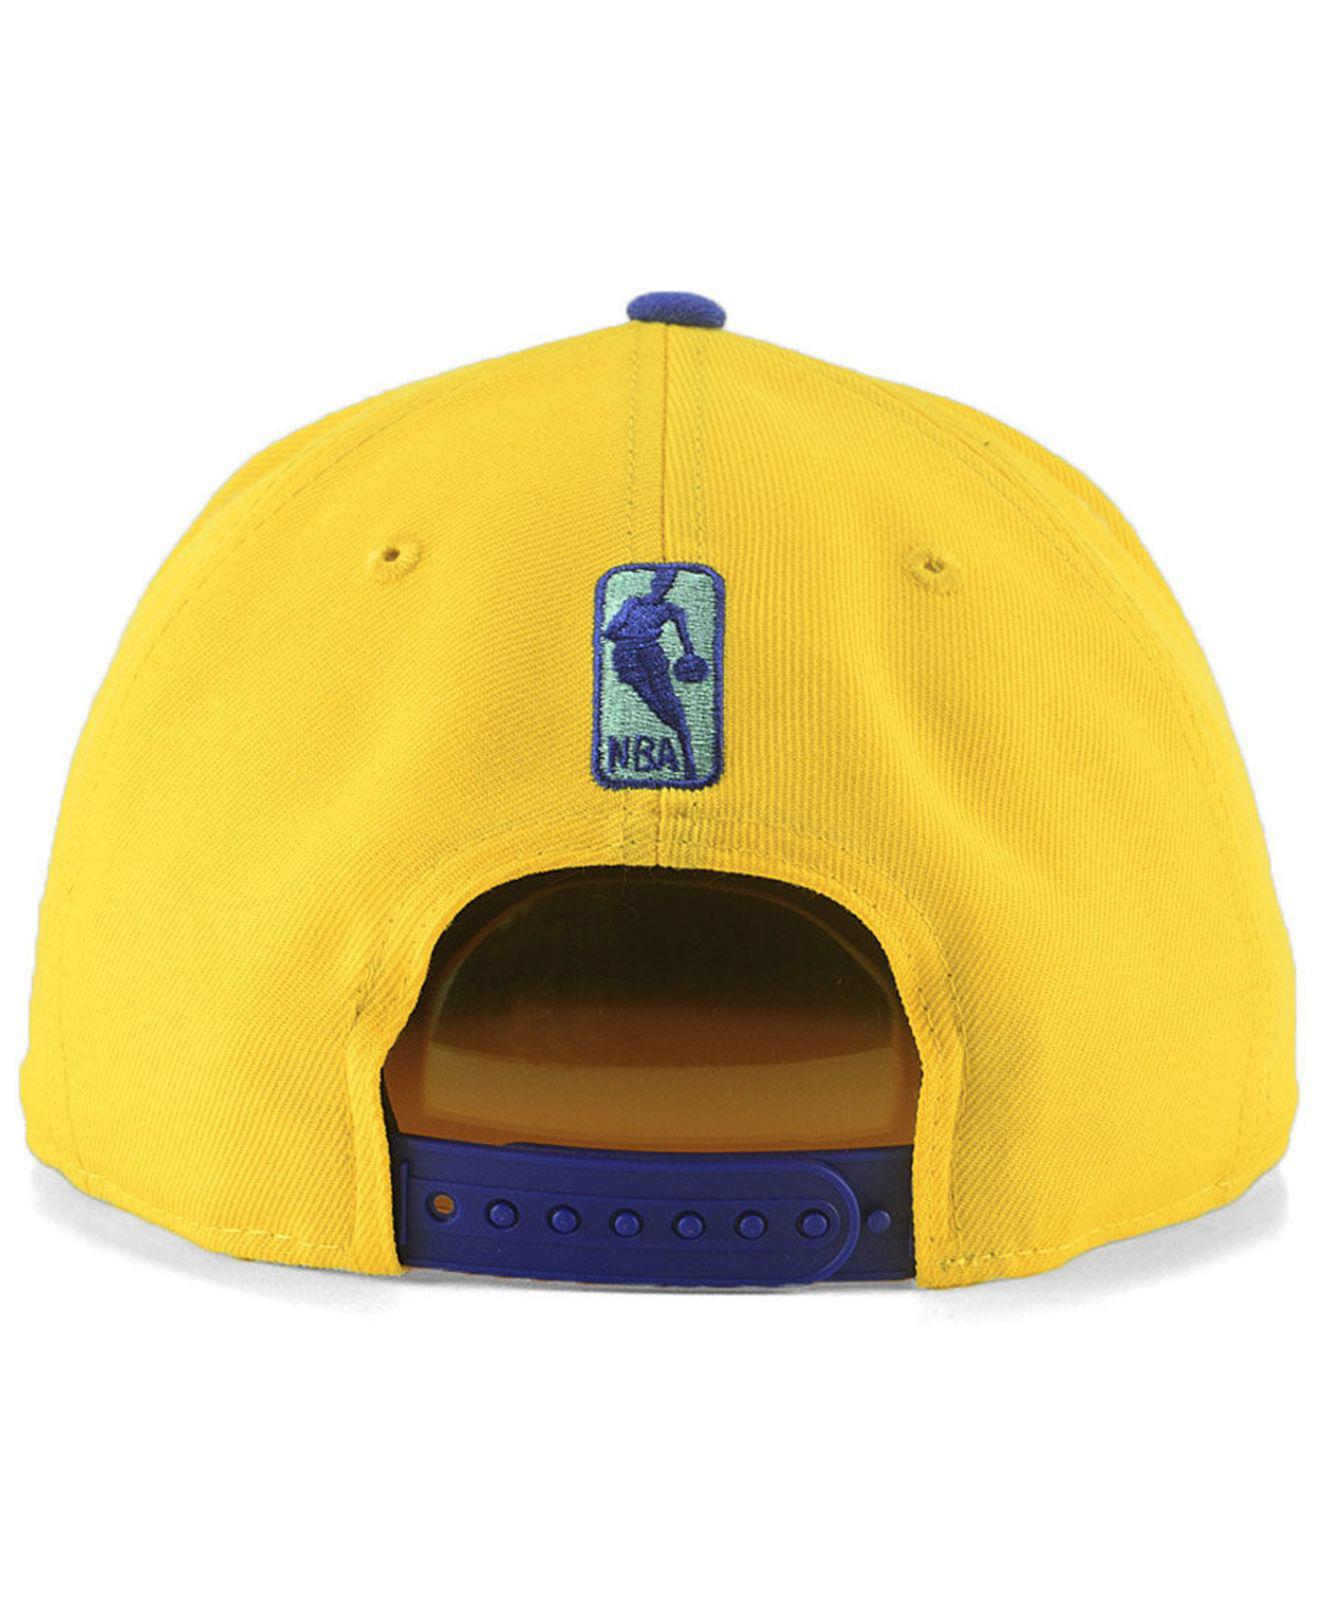 online retailer 19baa 59afe ... release date golden state warriors light city combo 9fifty snapback cap  for men lyst. view